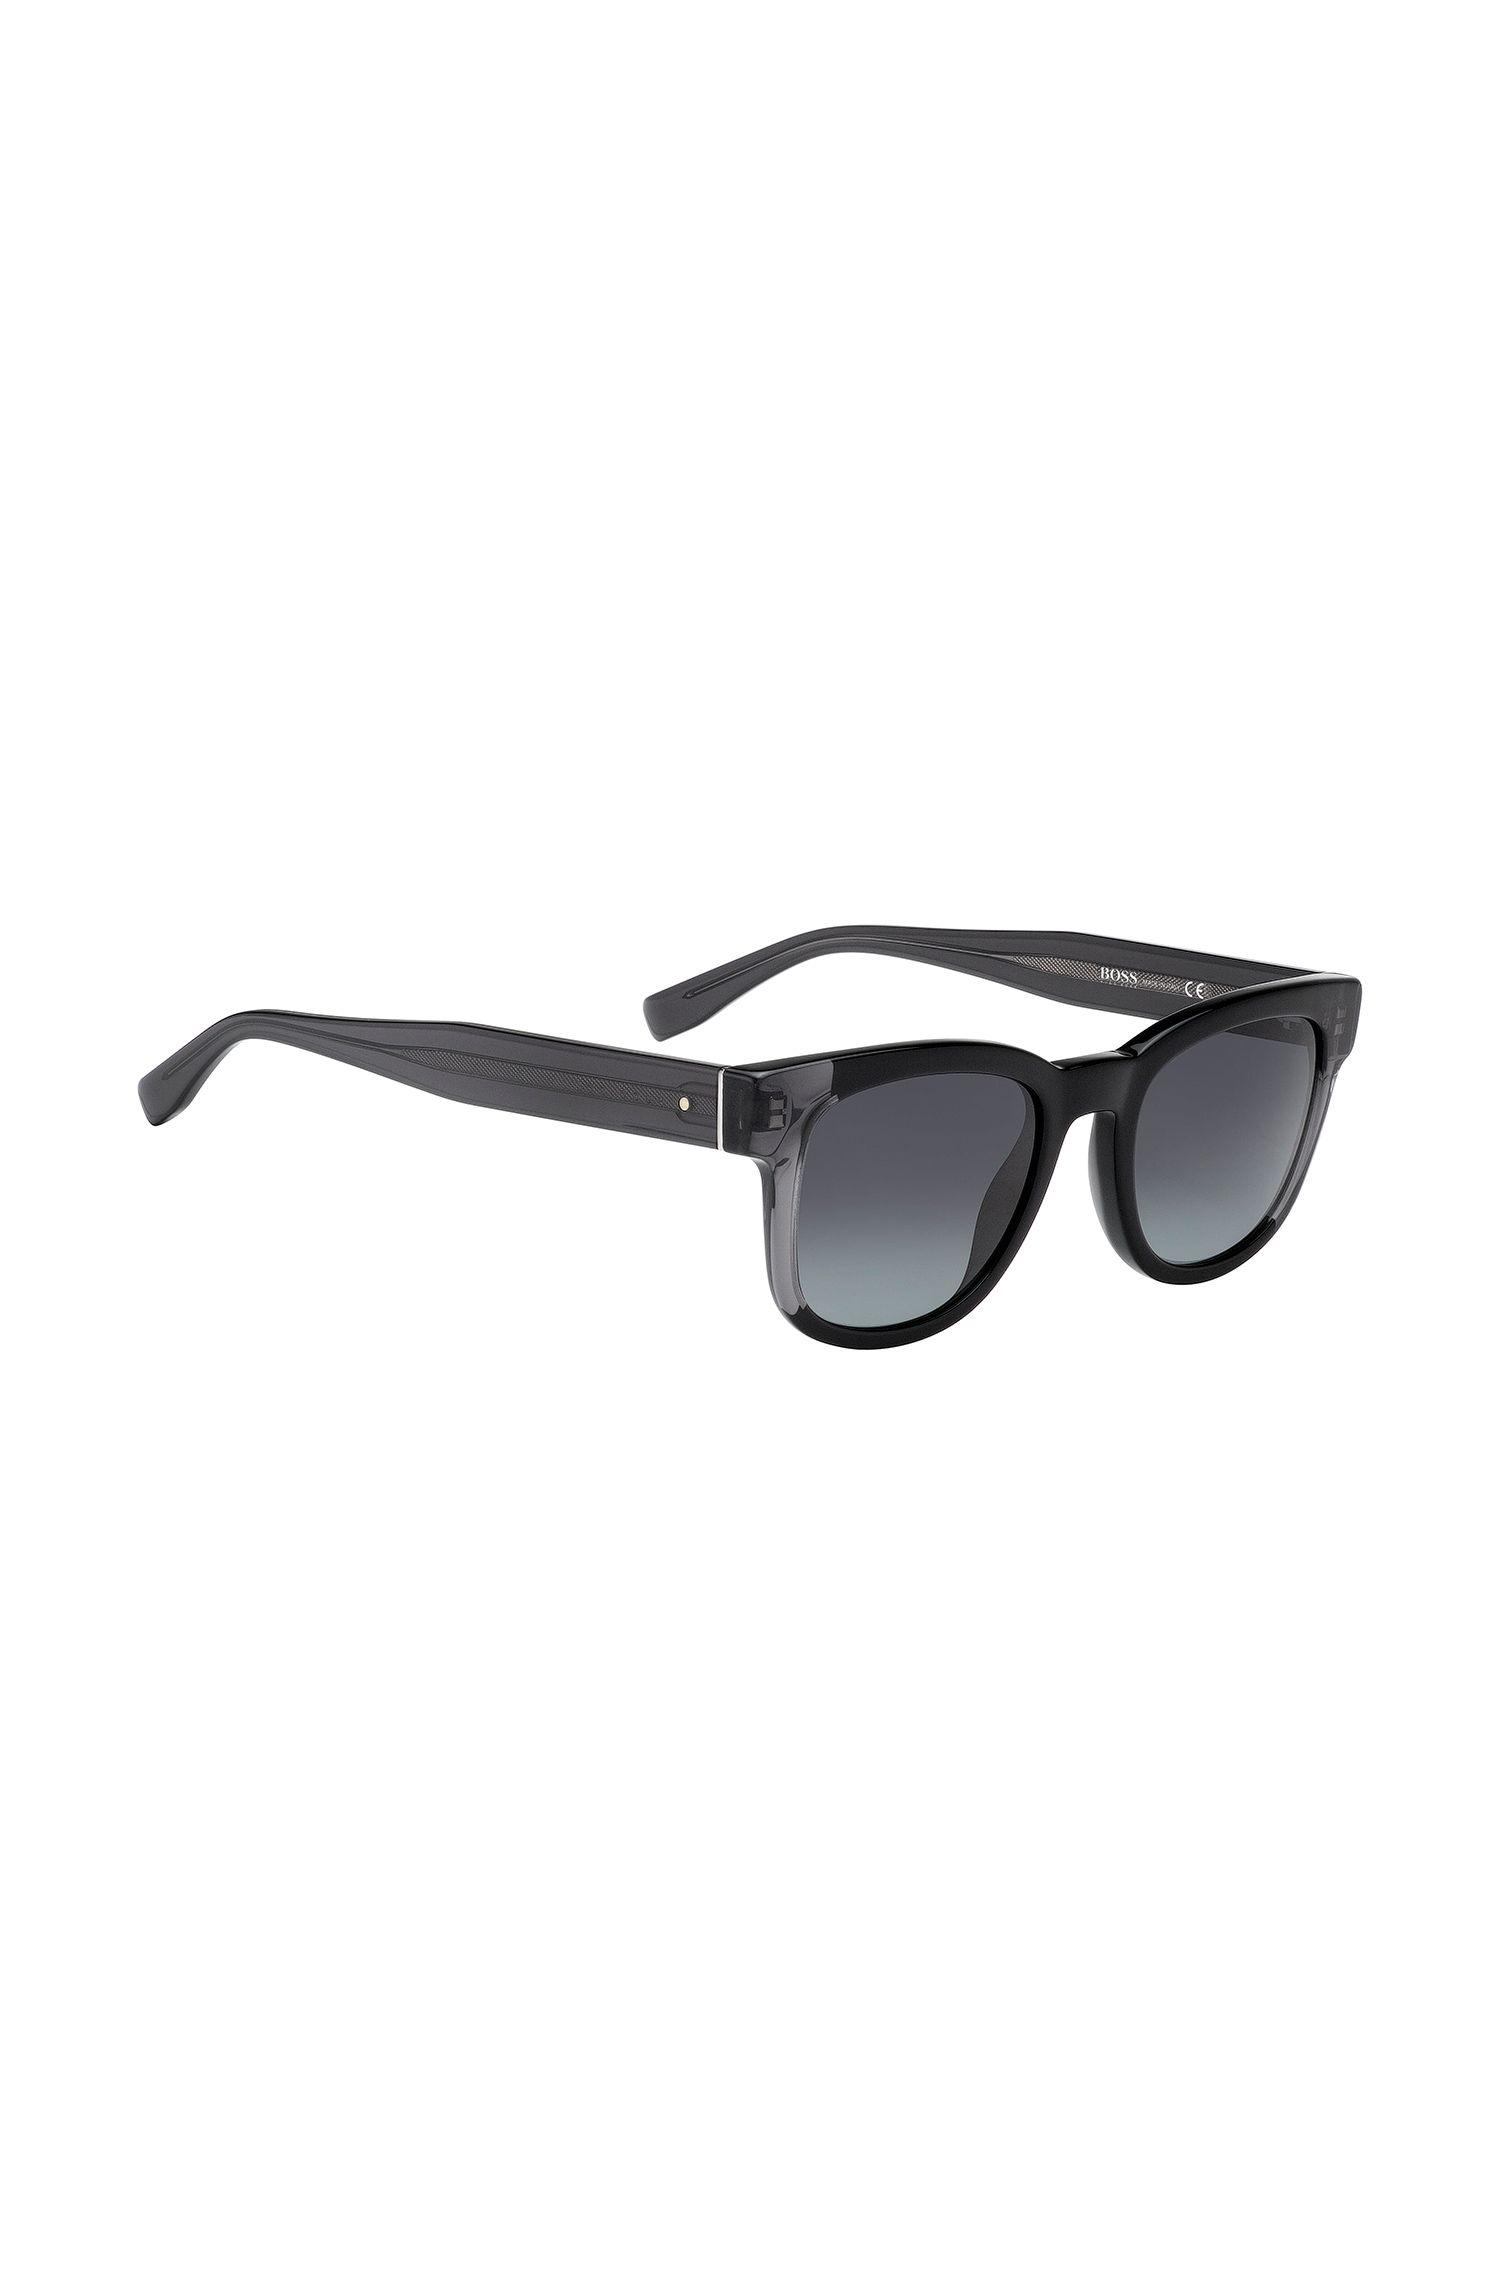 Sonnenbrille: 'BOSS 0736/S'